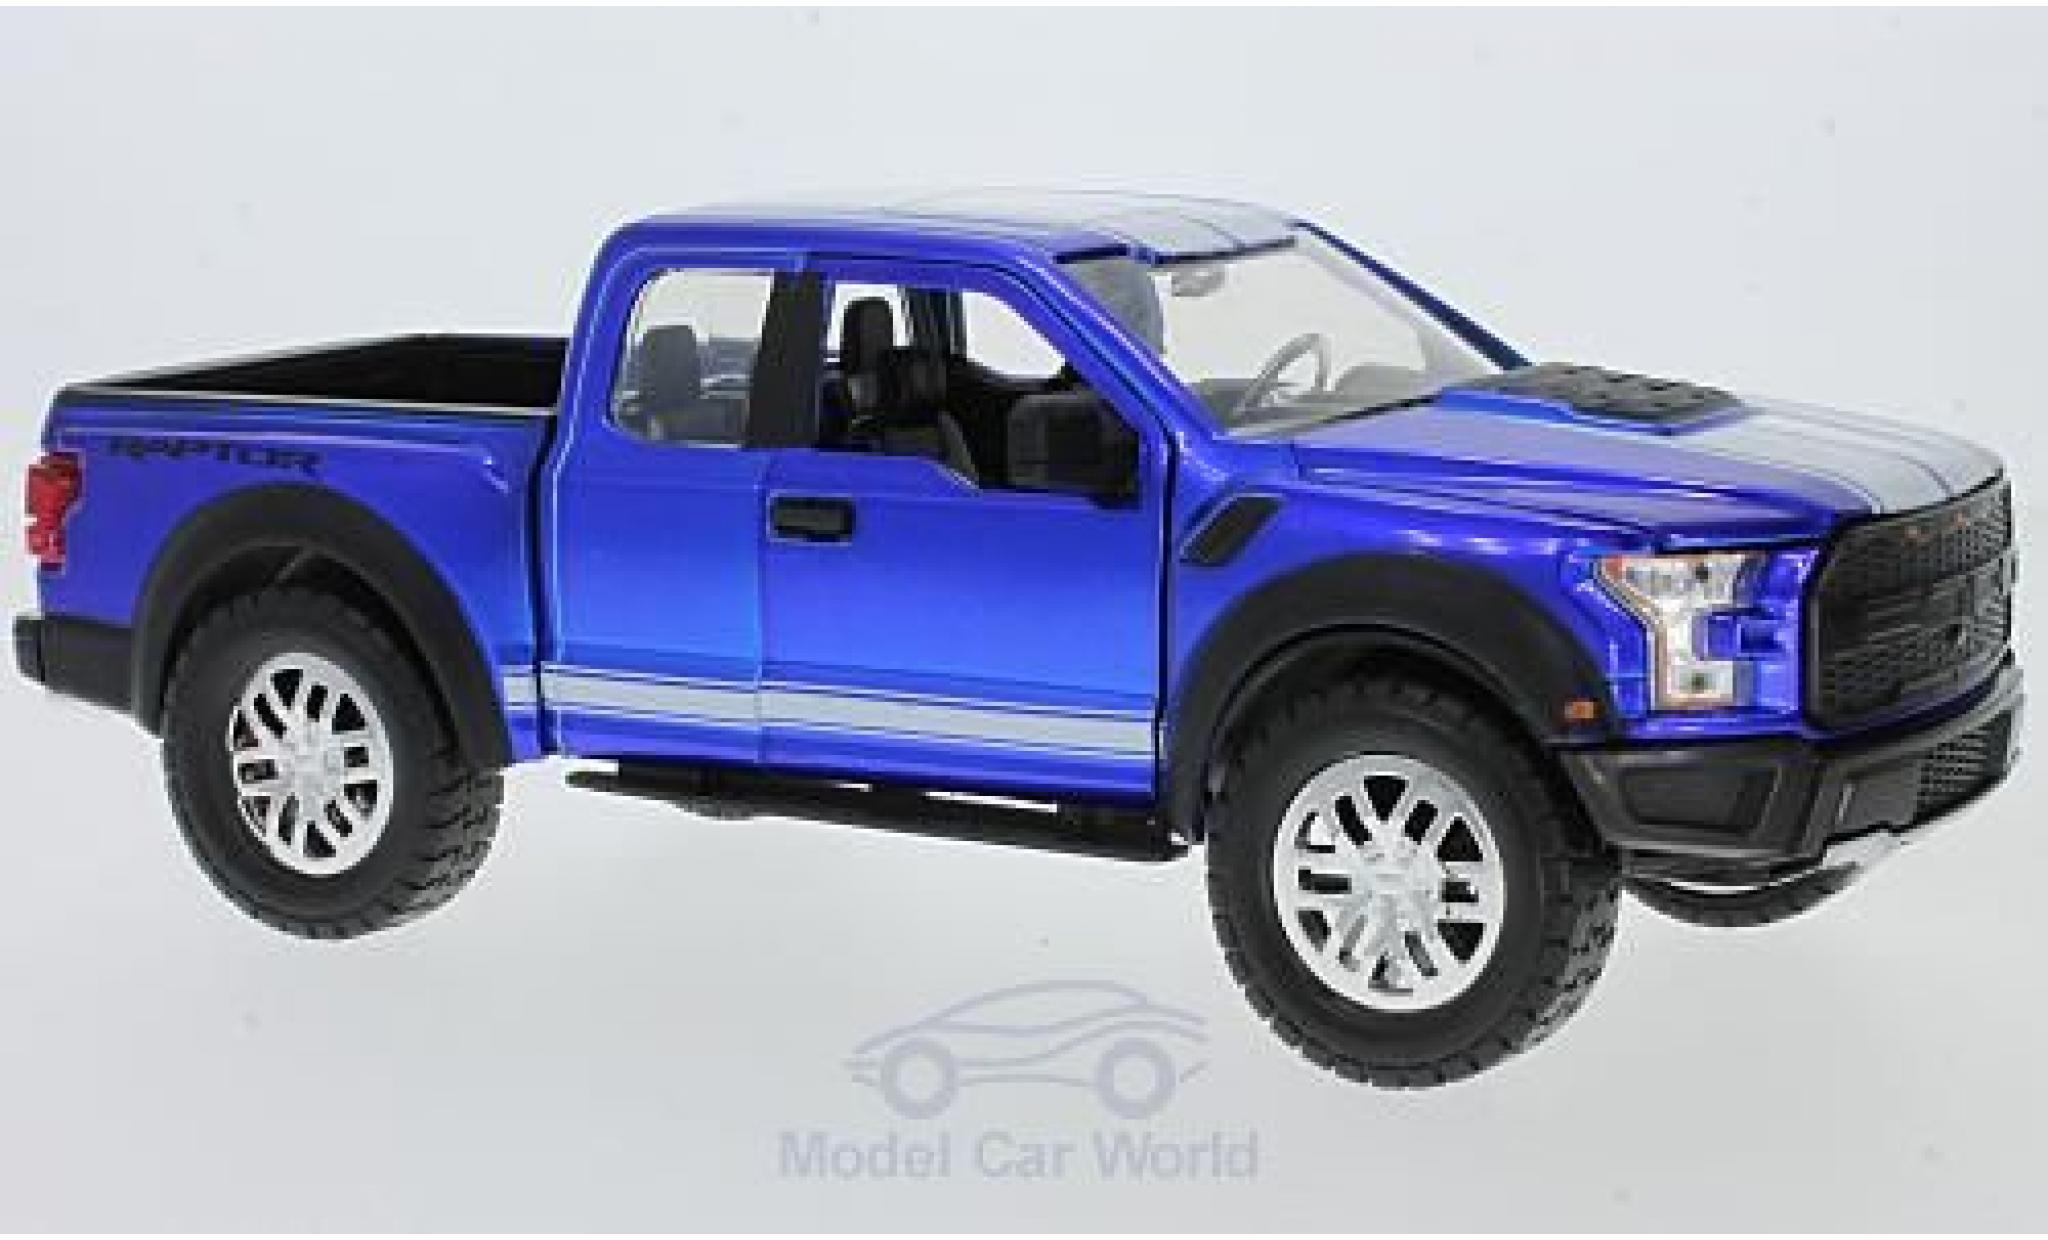 Ford F-1 1/24 Jada Toys 50 metallise bleue/blanche 2017 mit Tuningrädern